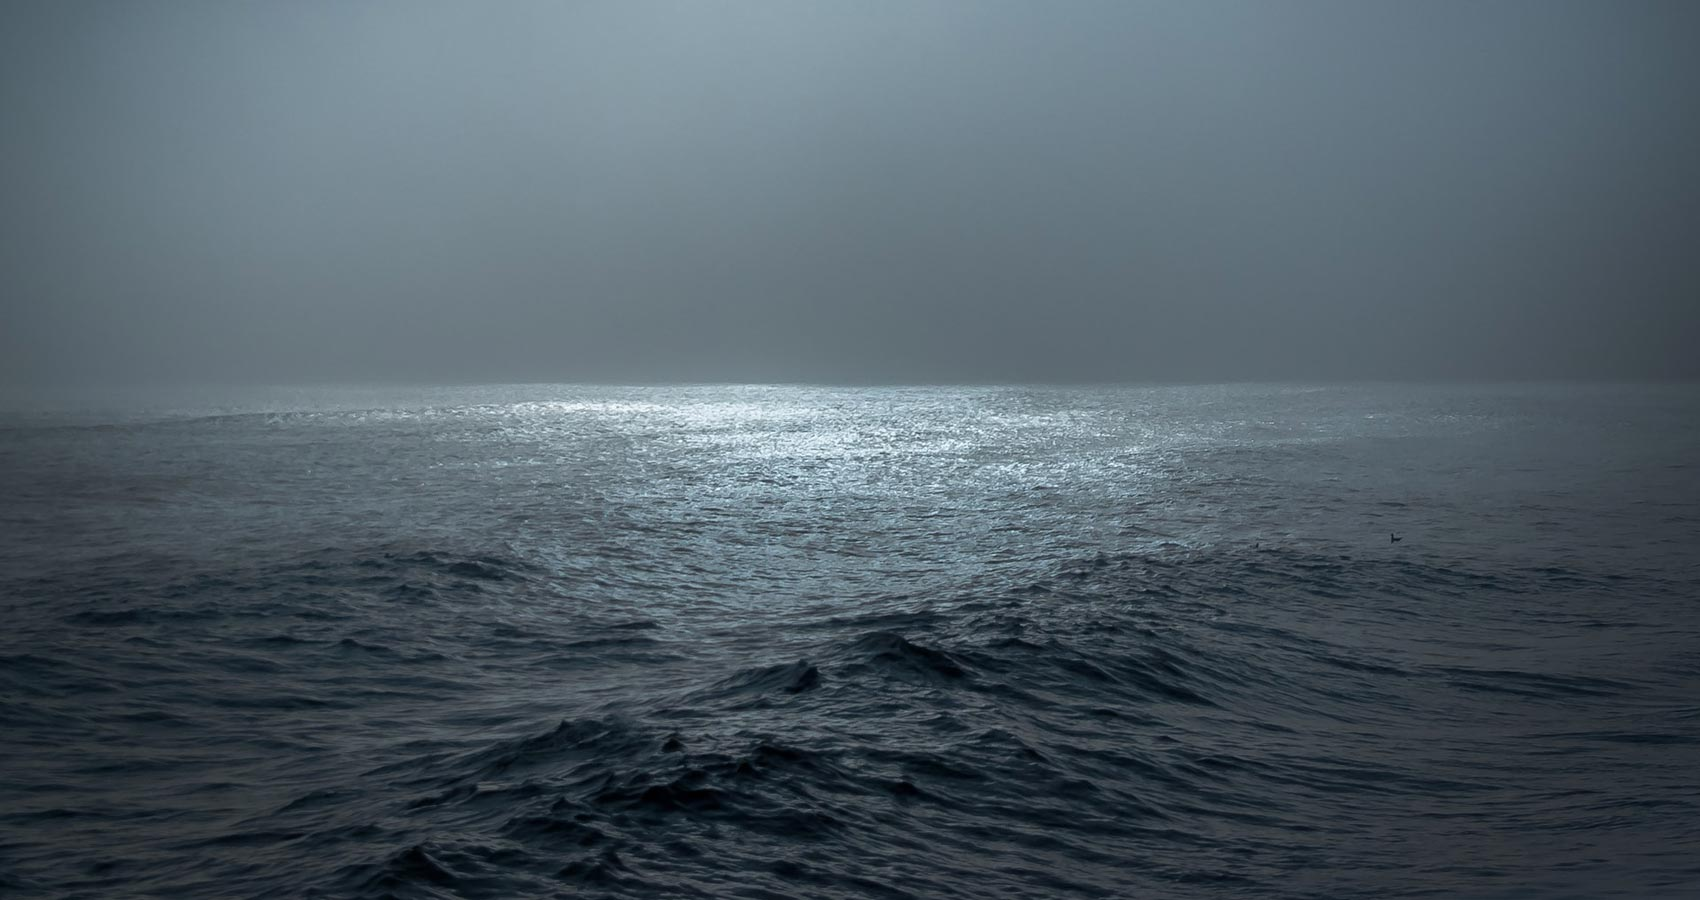 Absence of Light, a poem by Selvan Muruvan at Spillwords.com